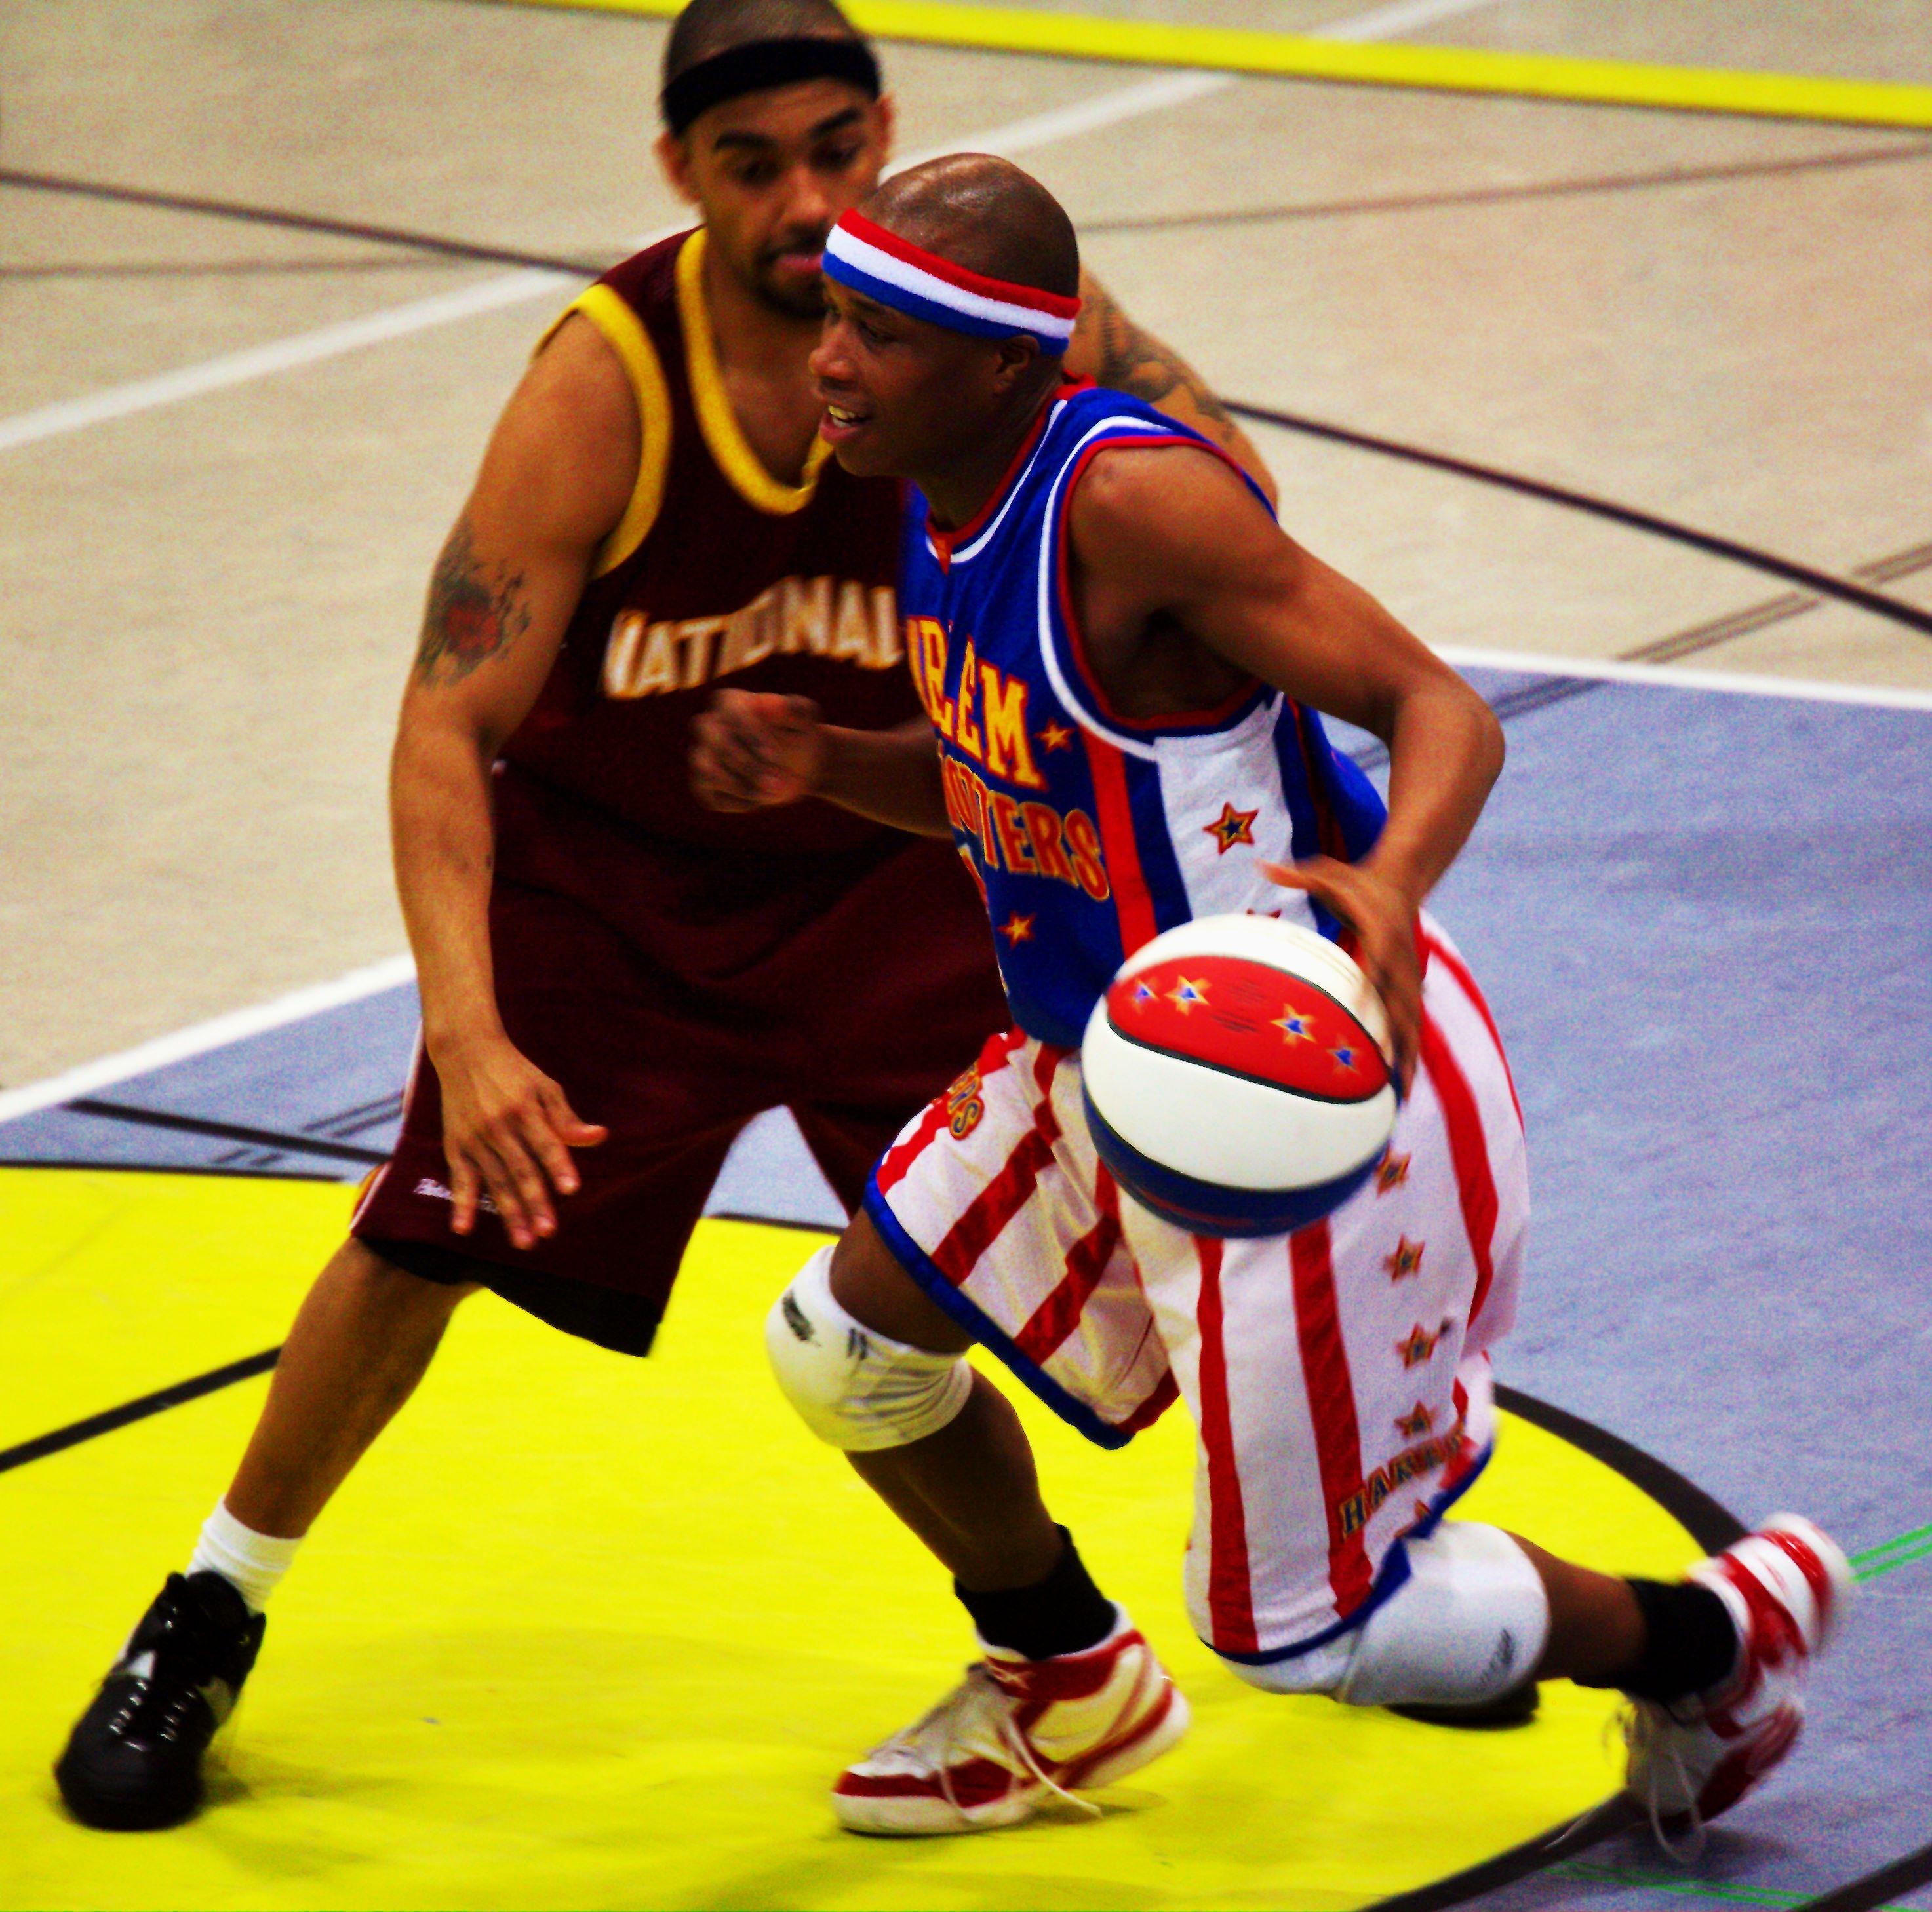 File:Harlem Globetrotters Dribbling 01.jpg